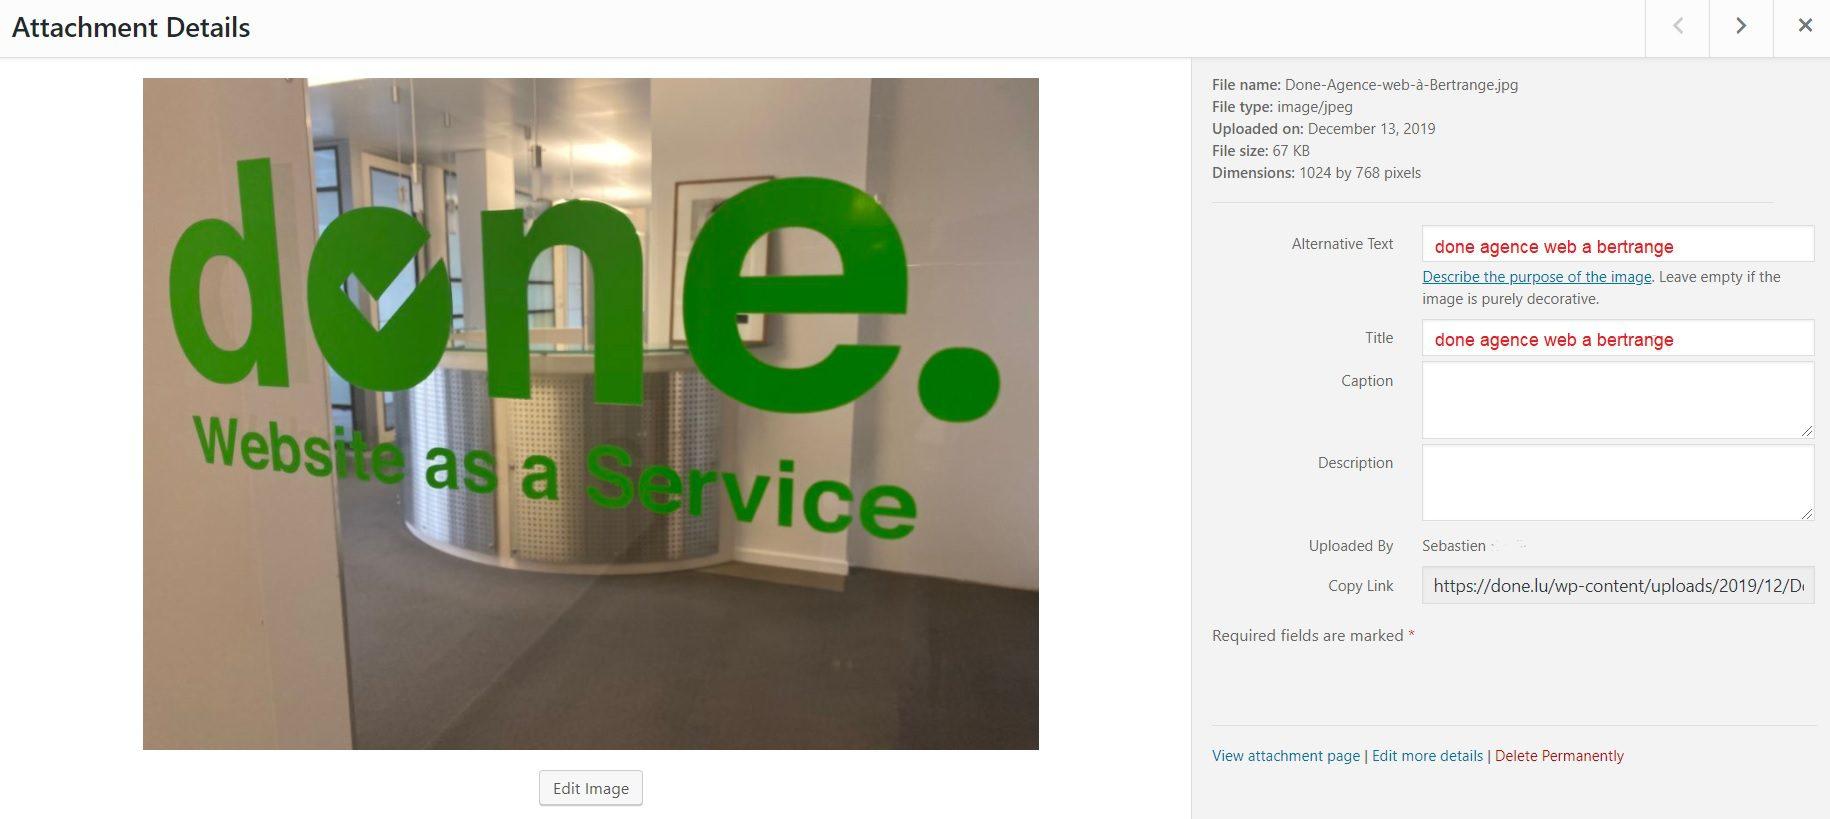 Done-Agence-web-à-Bertrange-1